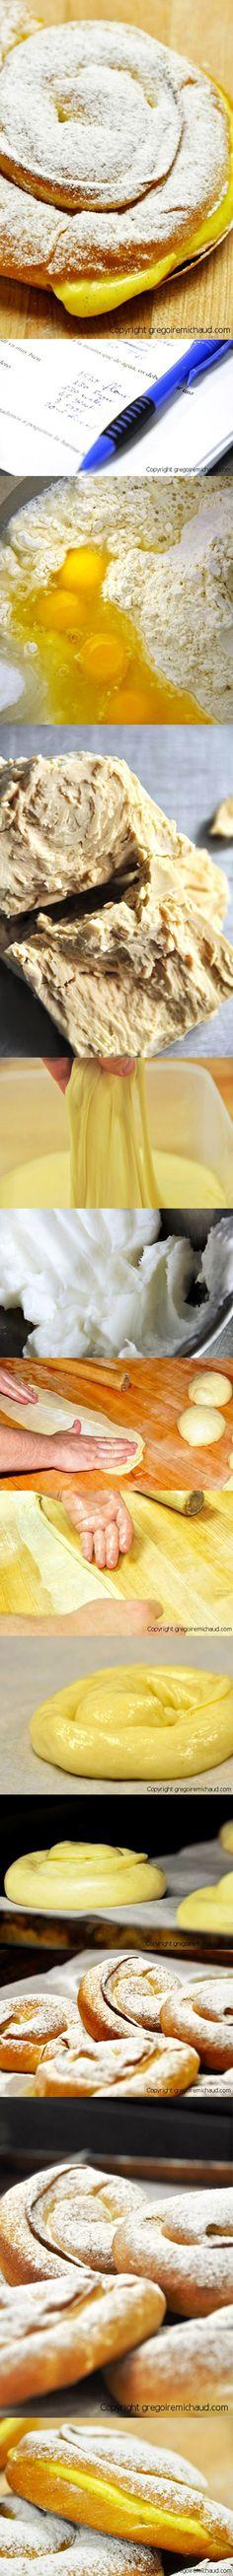 recipe-buns-sins-pastry-3